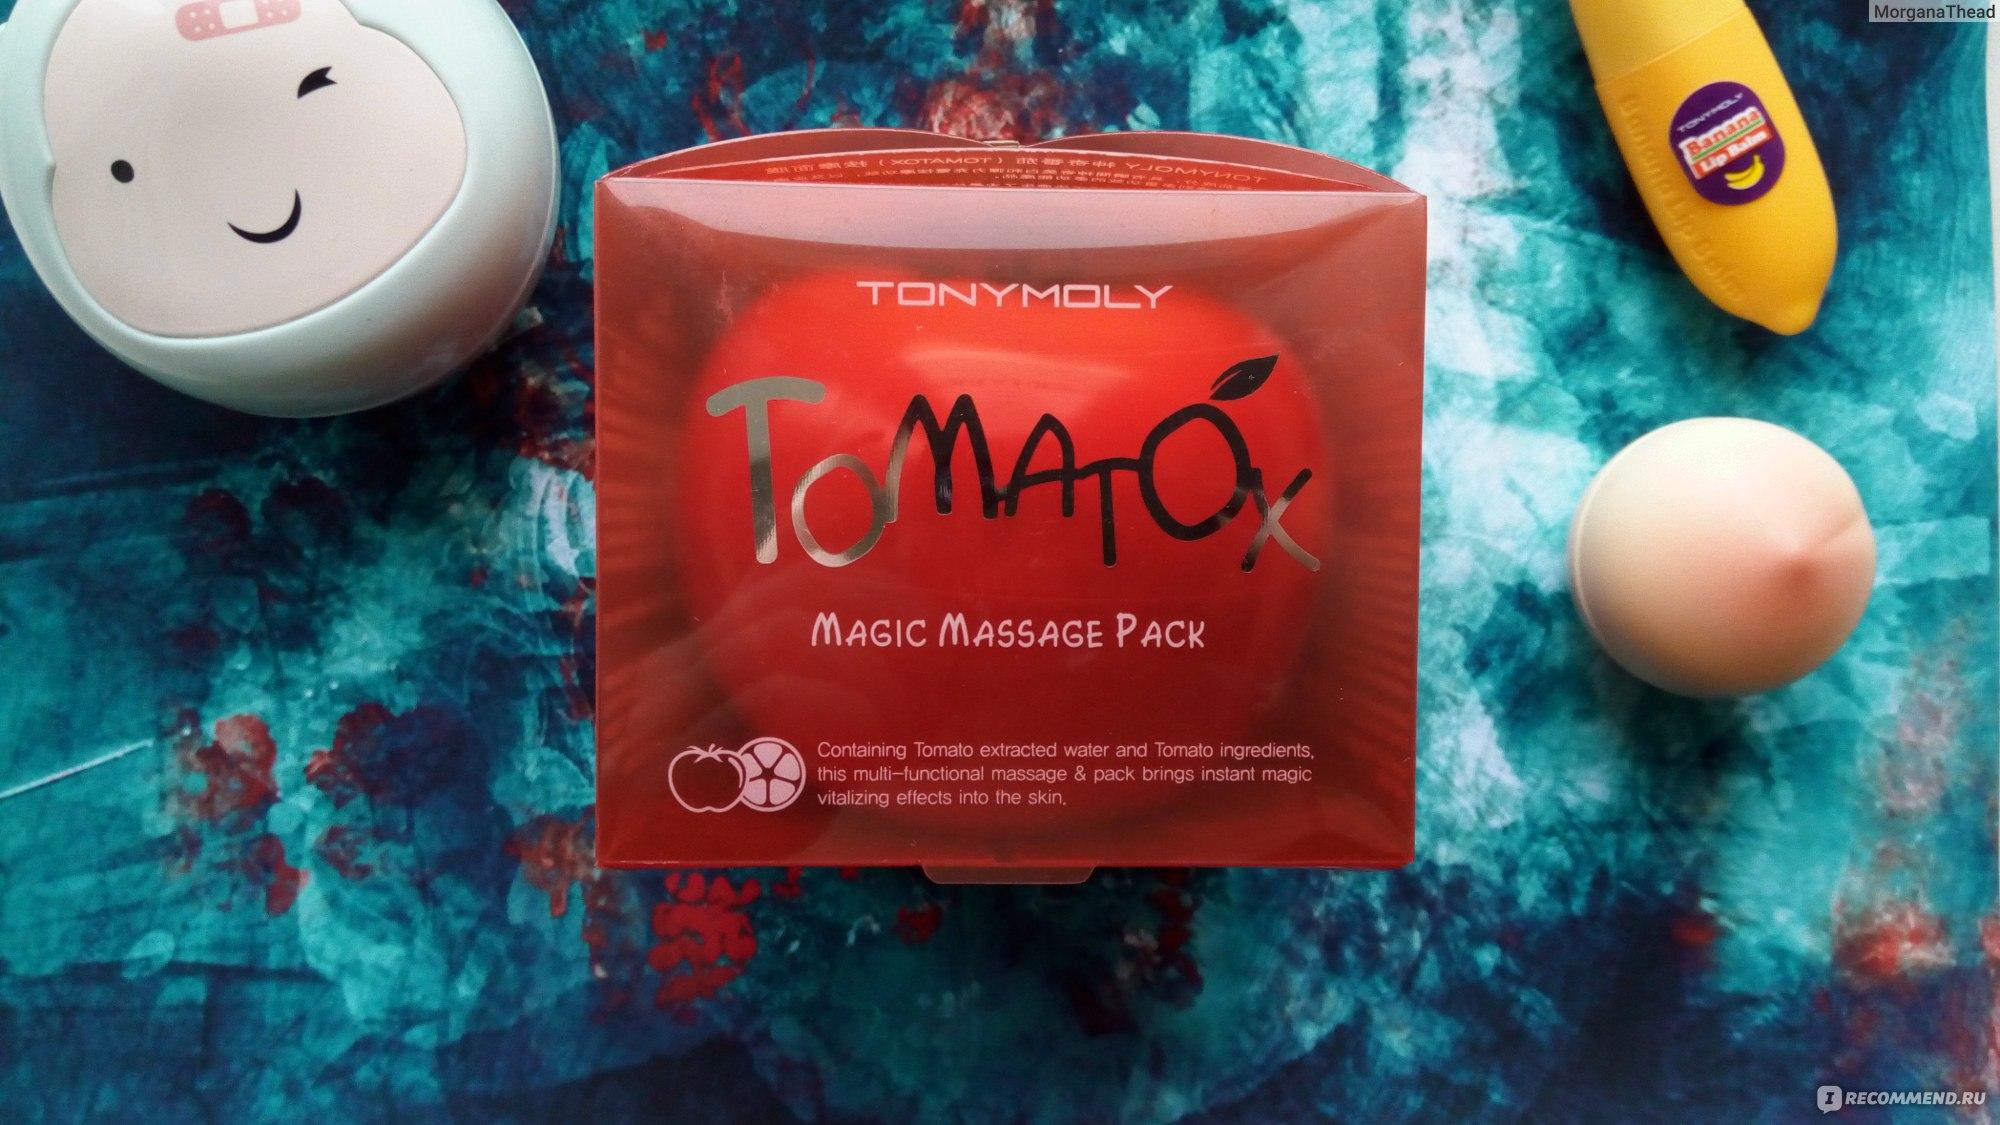 Тони моли косметика купить в красноярске му avon